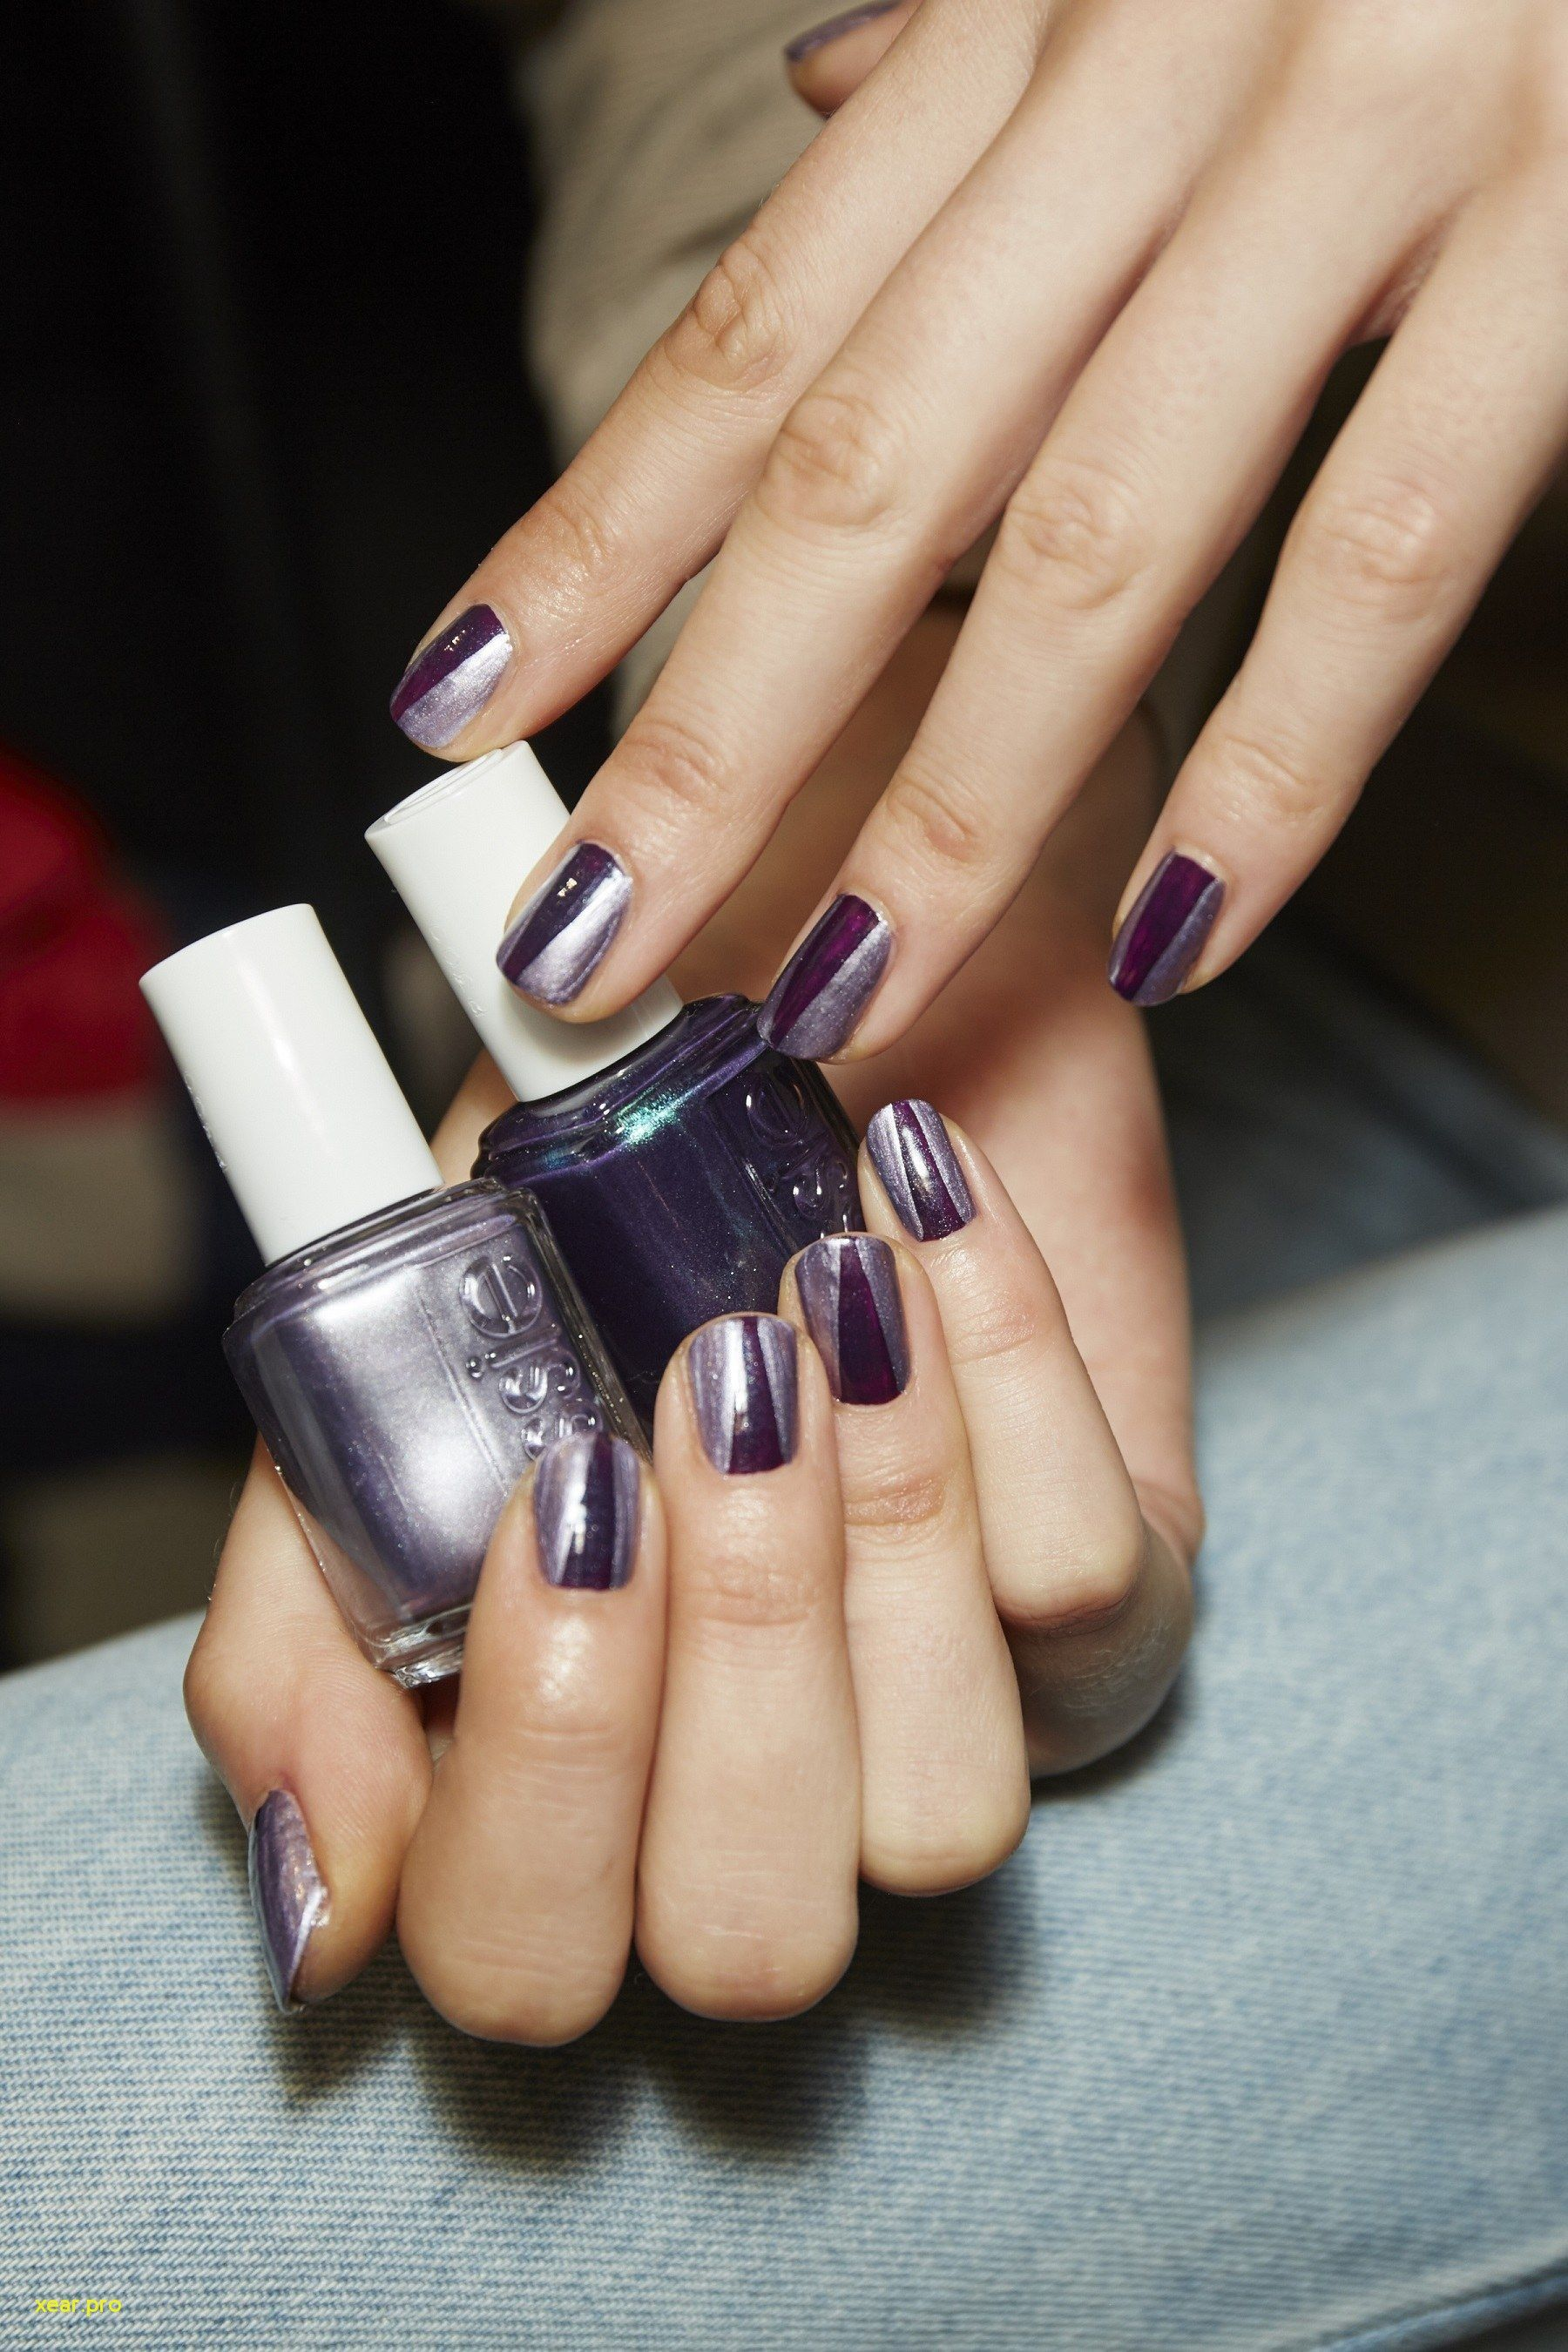 Spring 2018 Nail Polish Colors Uk Colorpaints Co